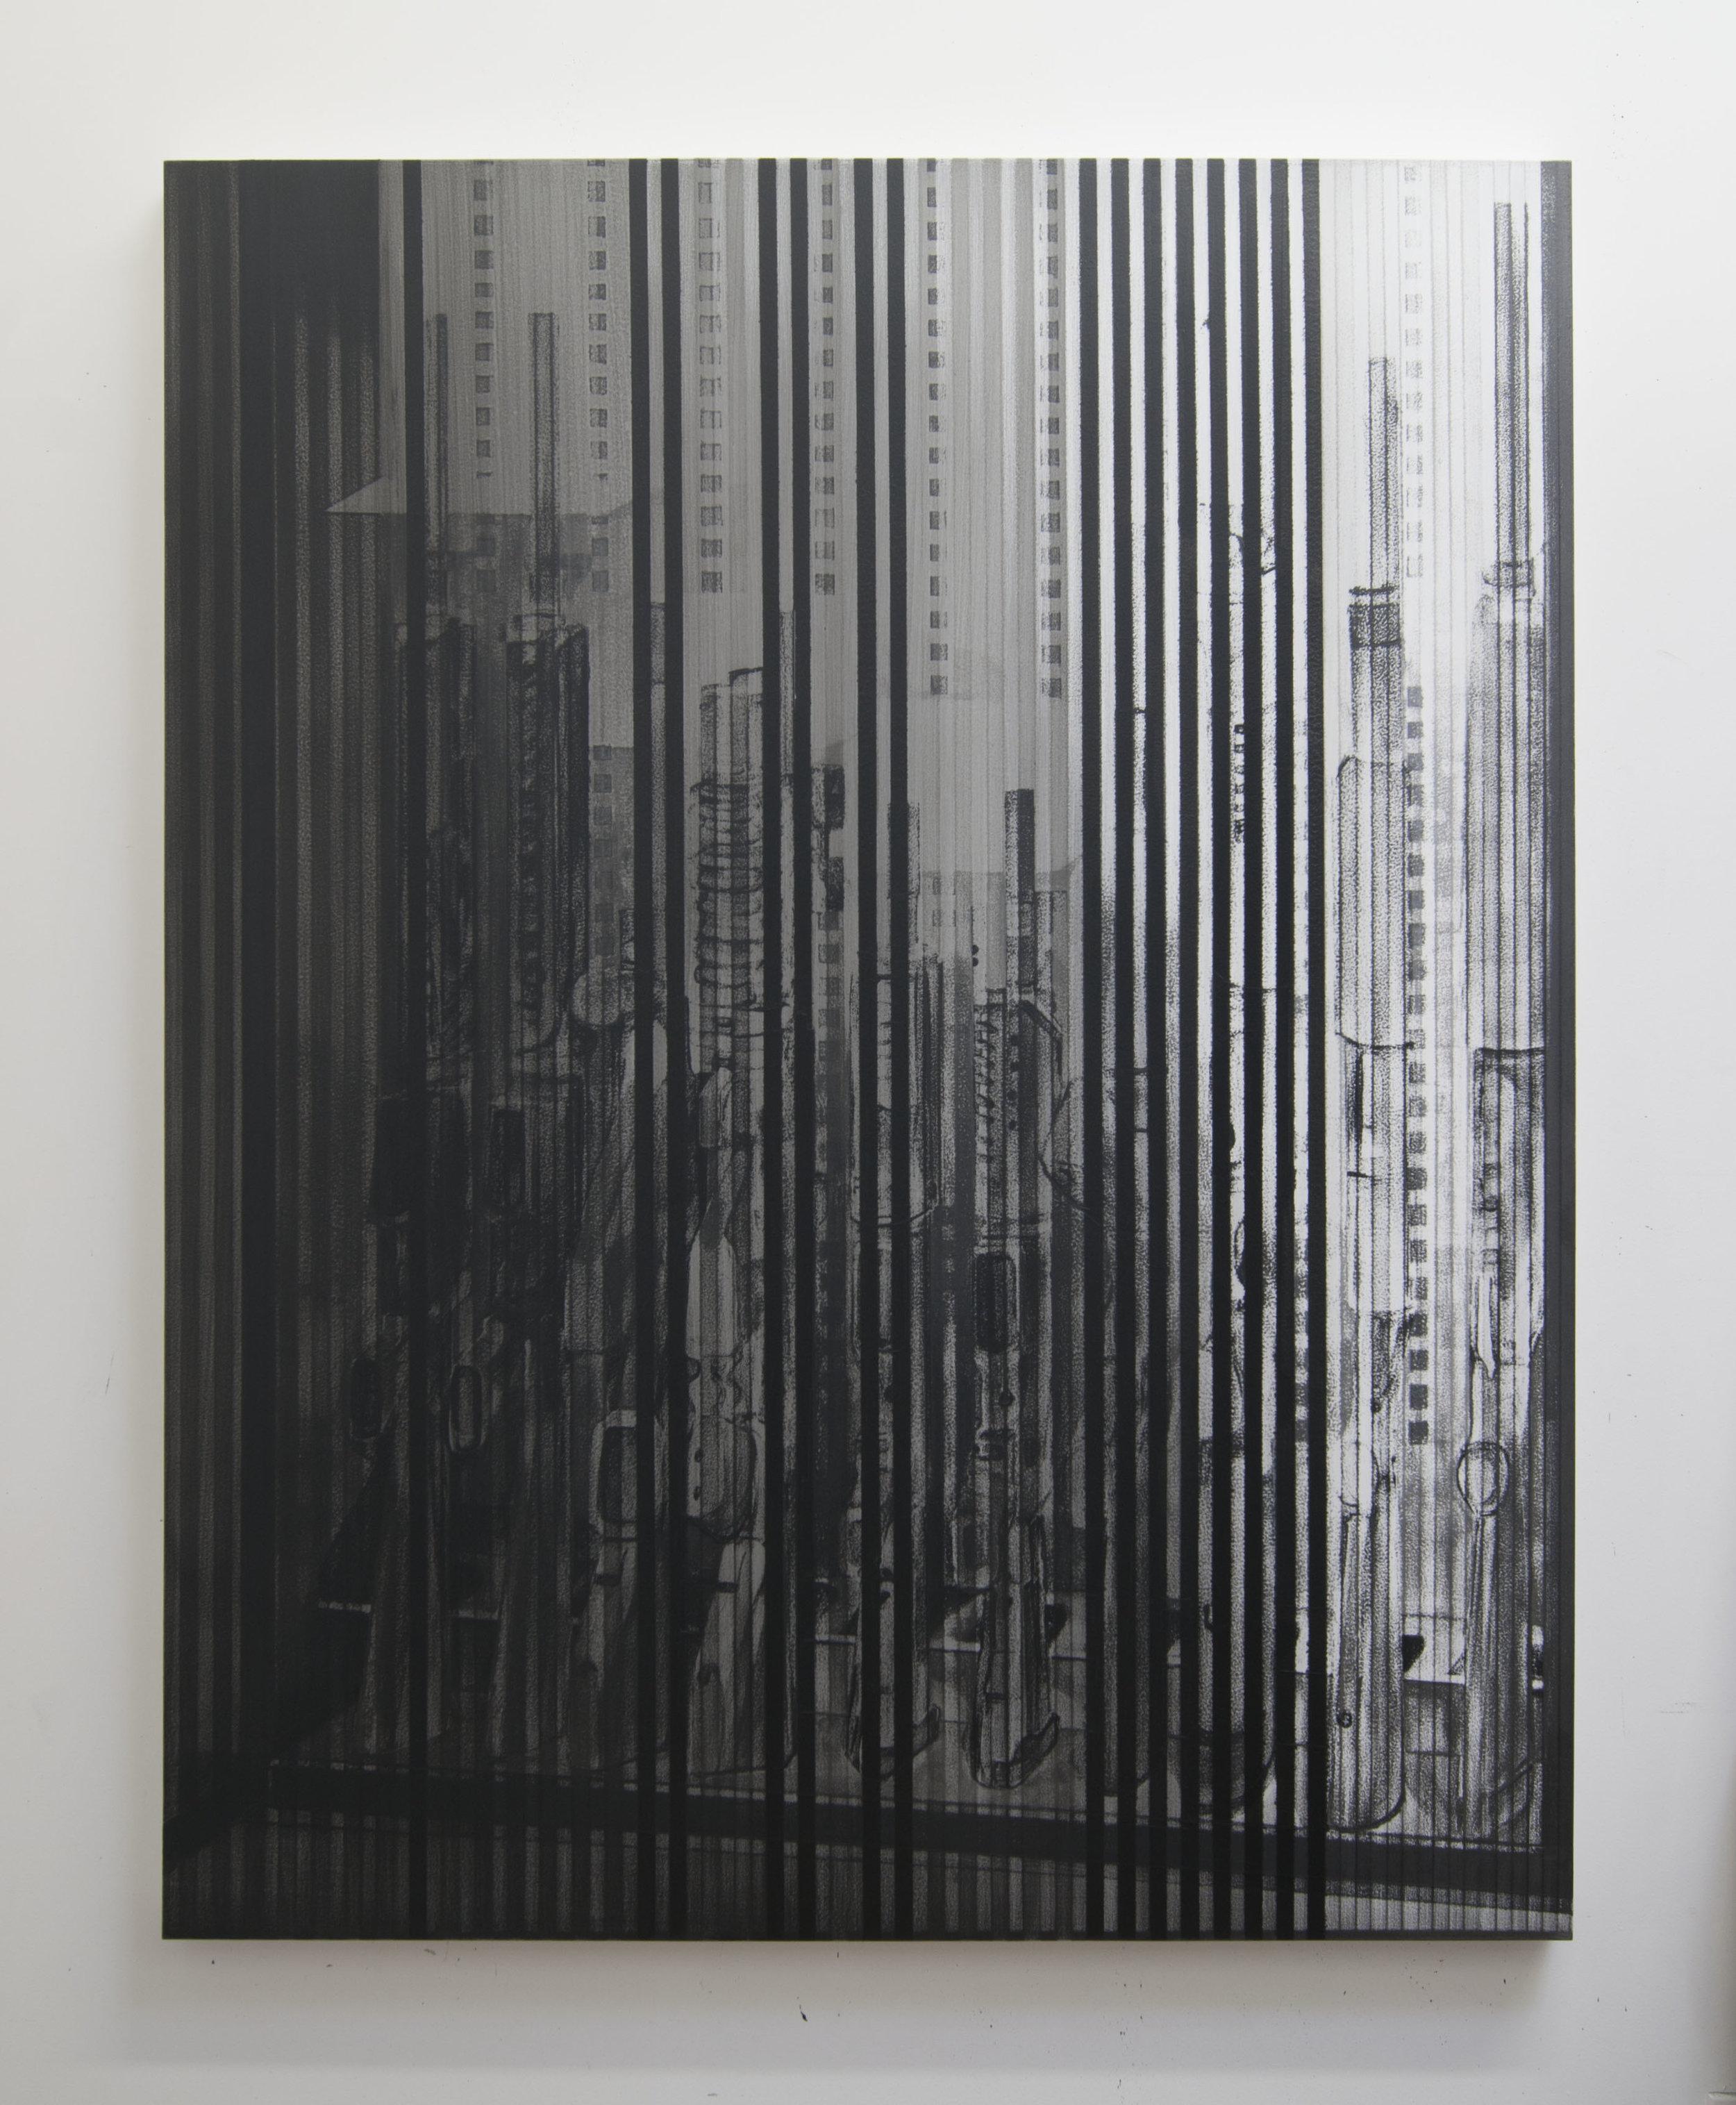 Rifle Locker IX, 2015  Acrylic on panel, 56 x 44 inches